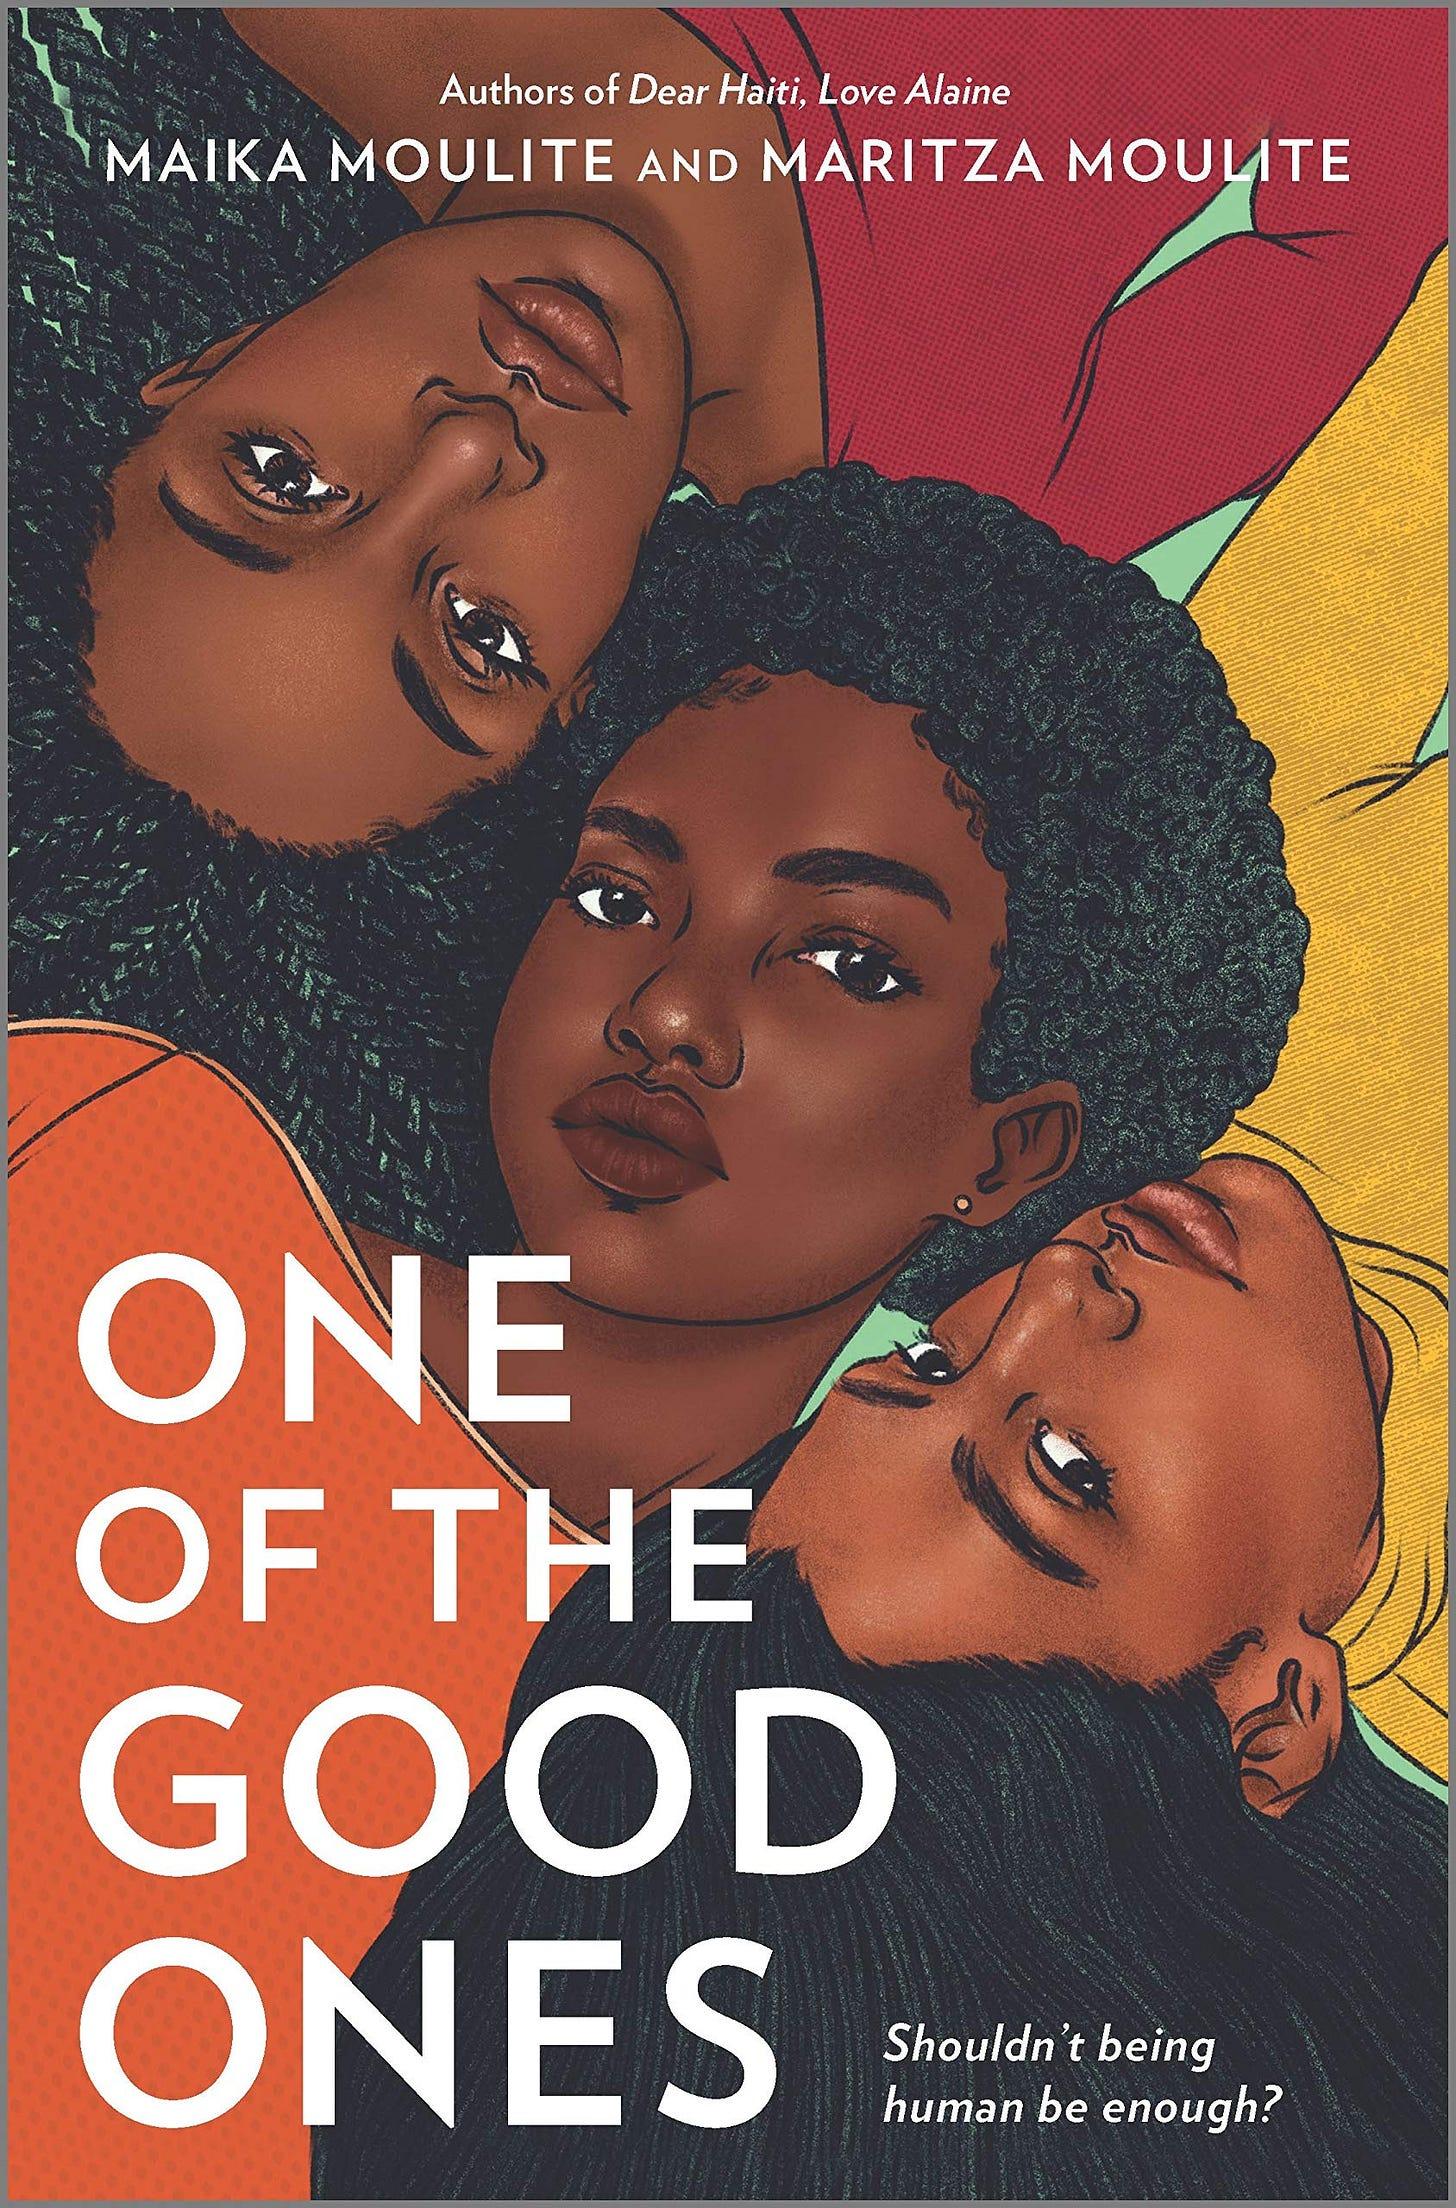 Amazon.com: One of the Good Ones (9781335145802): Moulite, Maika, Moulite,  Maritza: Books